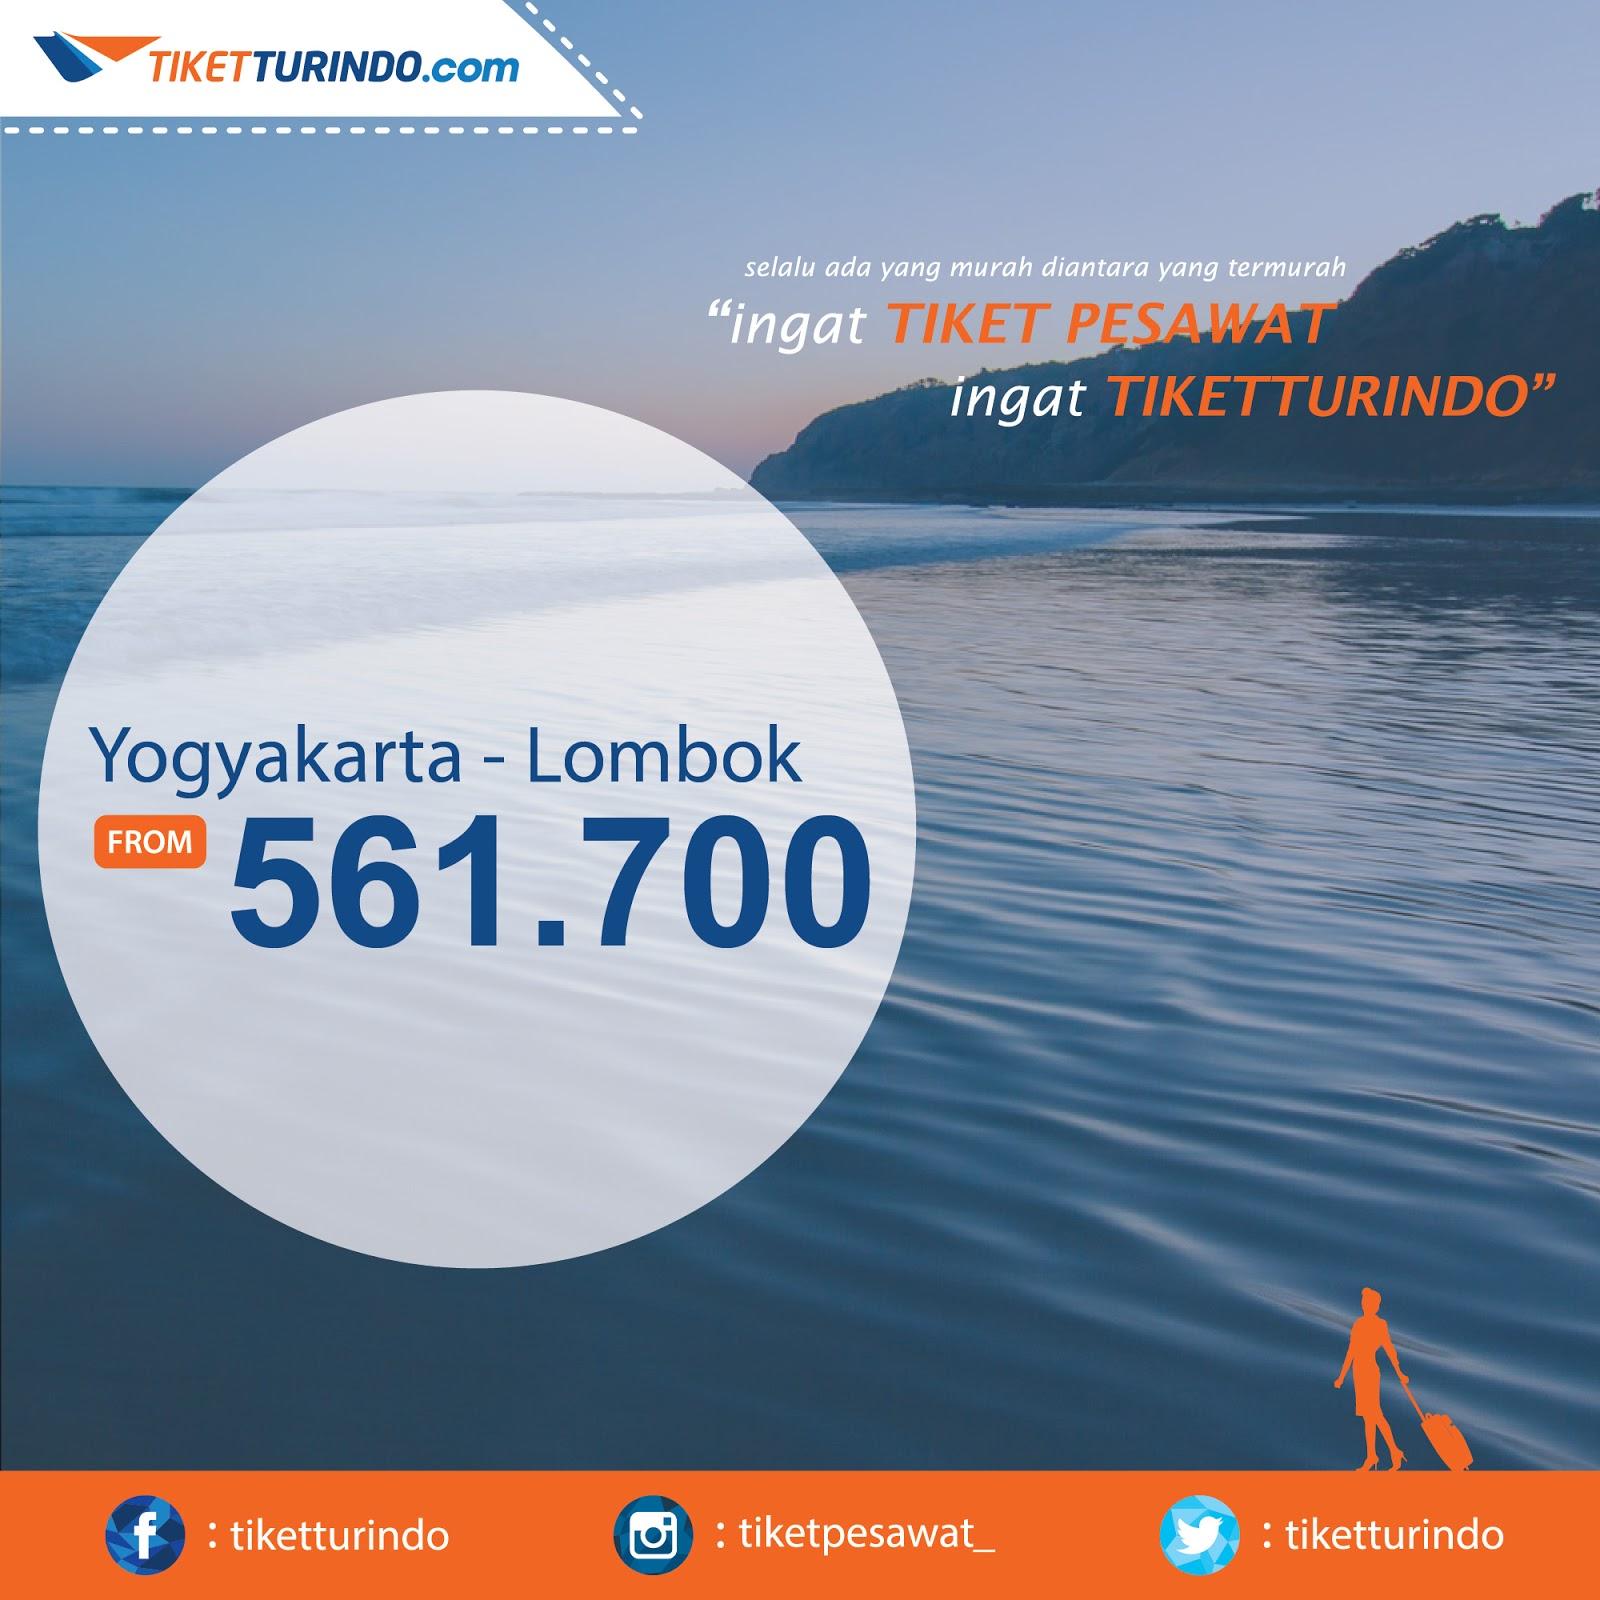 tiket pesawat promo ke lombok bellissimonyc com u2022 rh bellissimonyc com harga tiket pesawat lombok bima harga tiket pesawat lombok jakarta